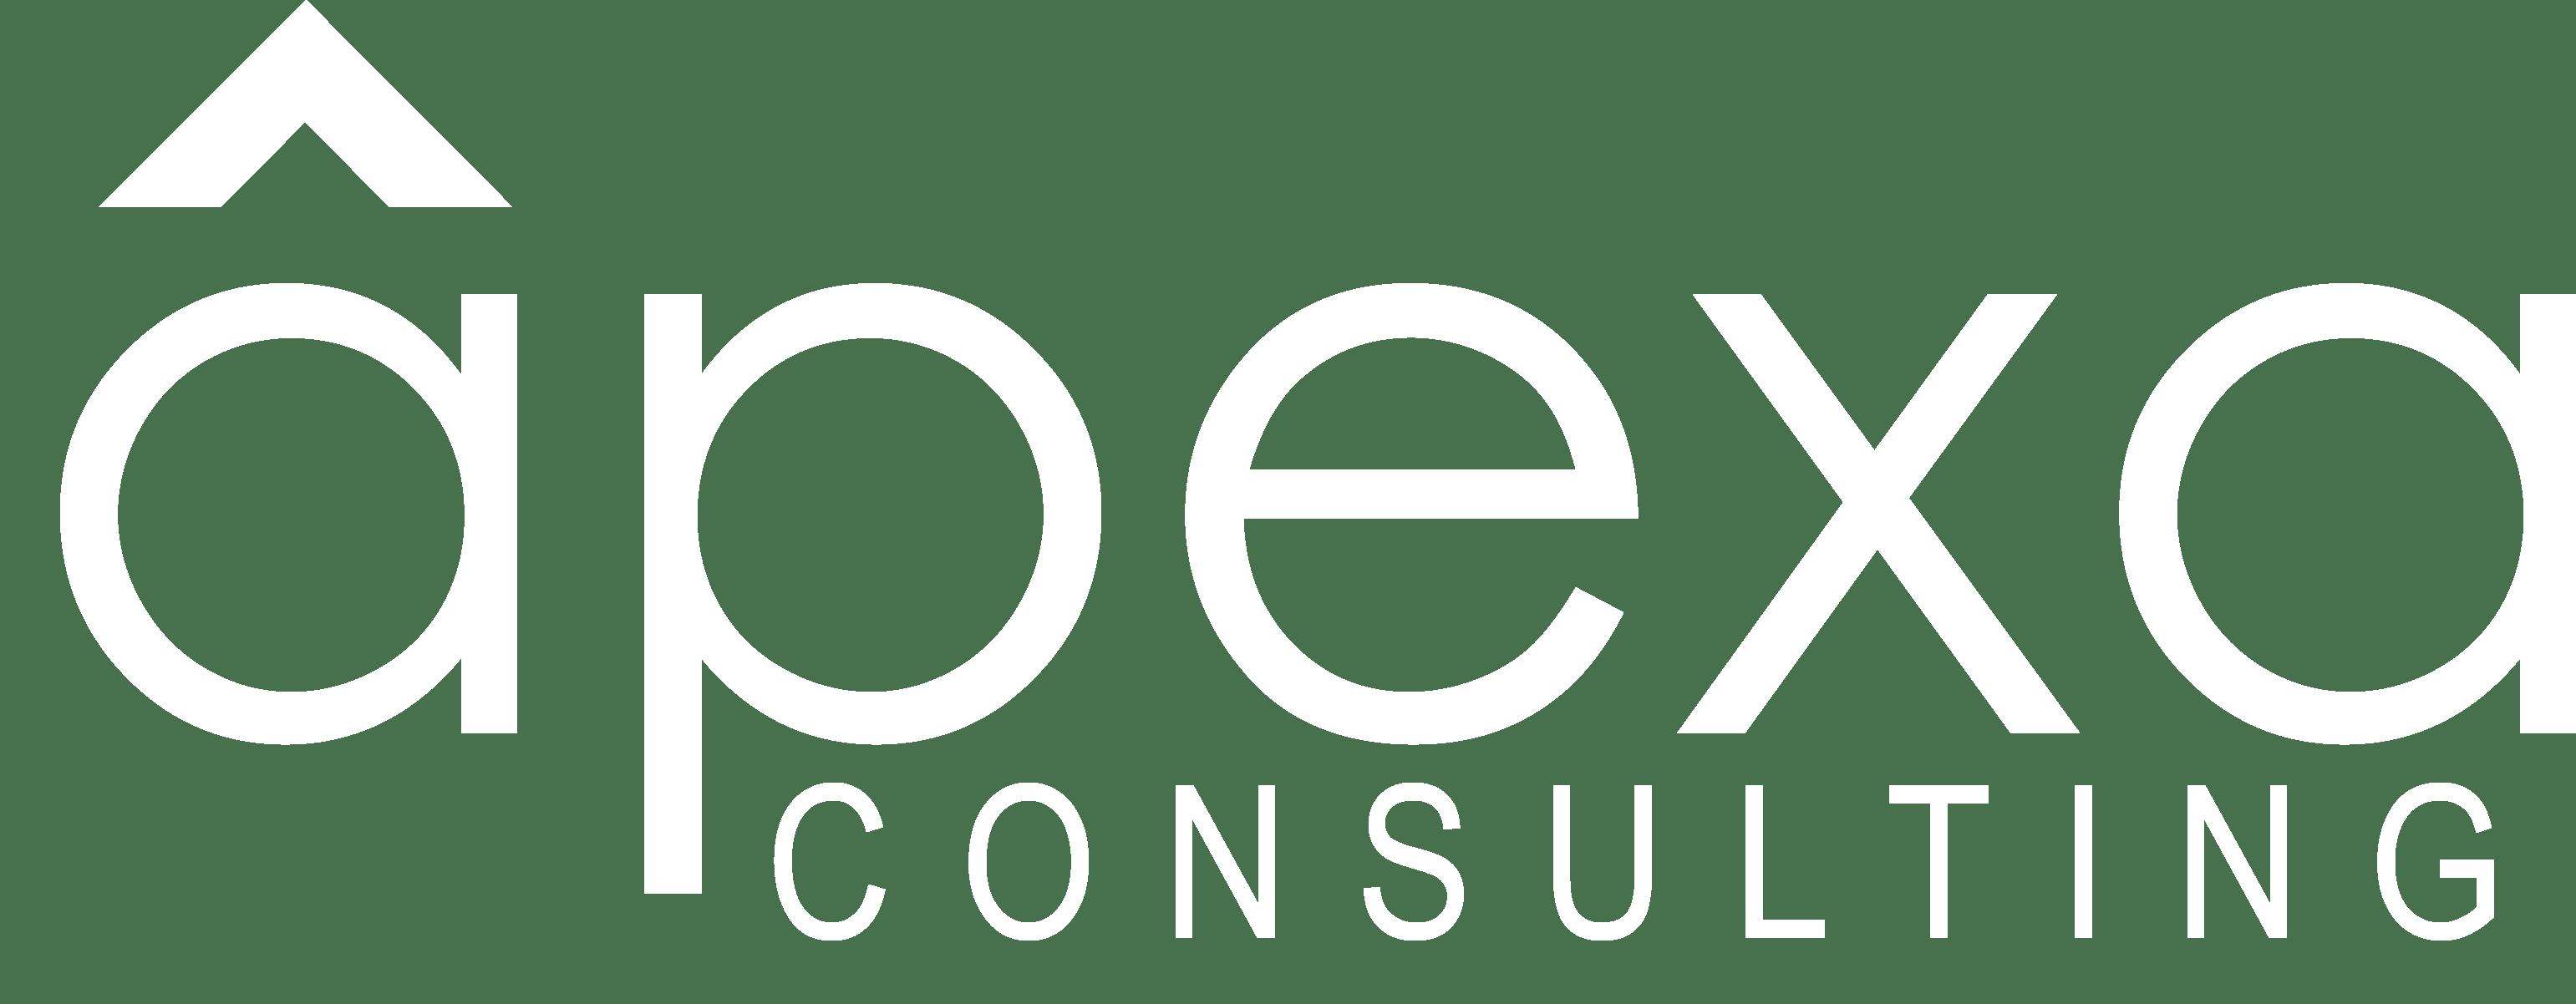 Apexa Consulting